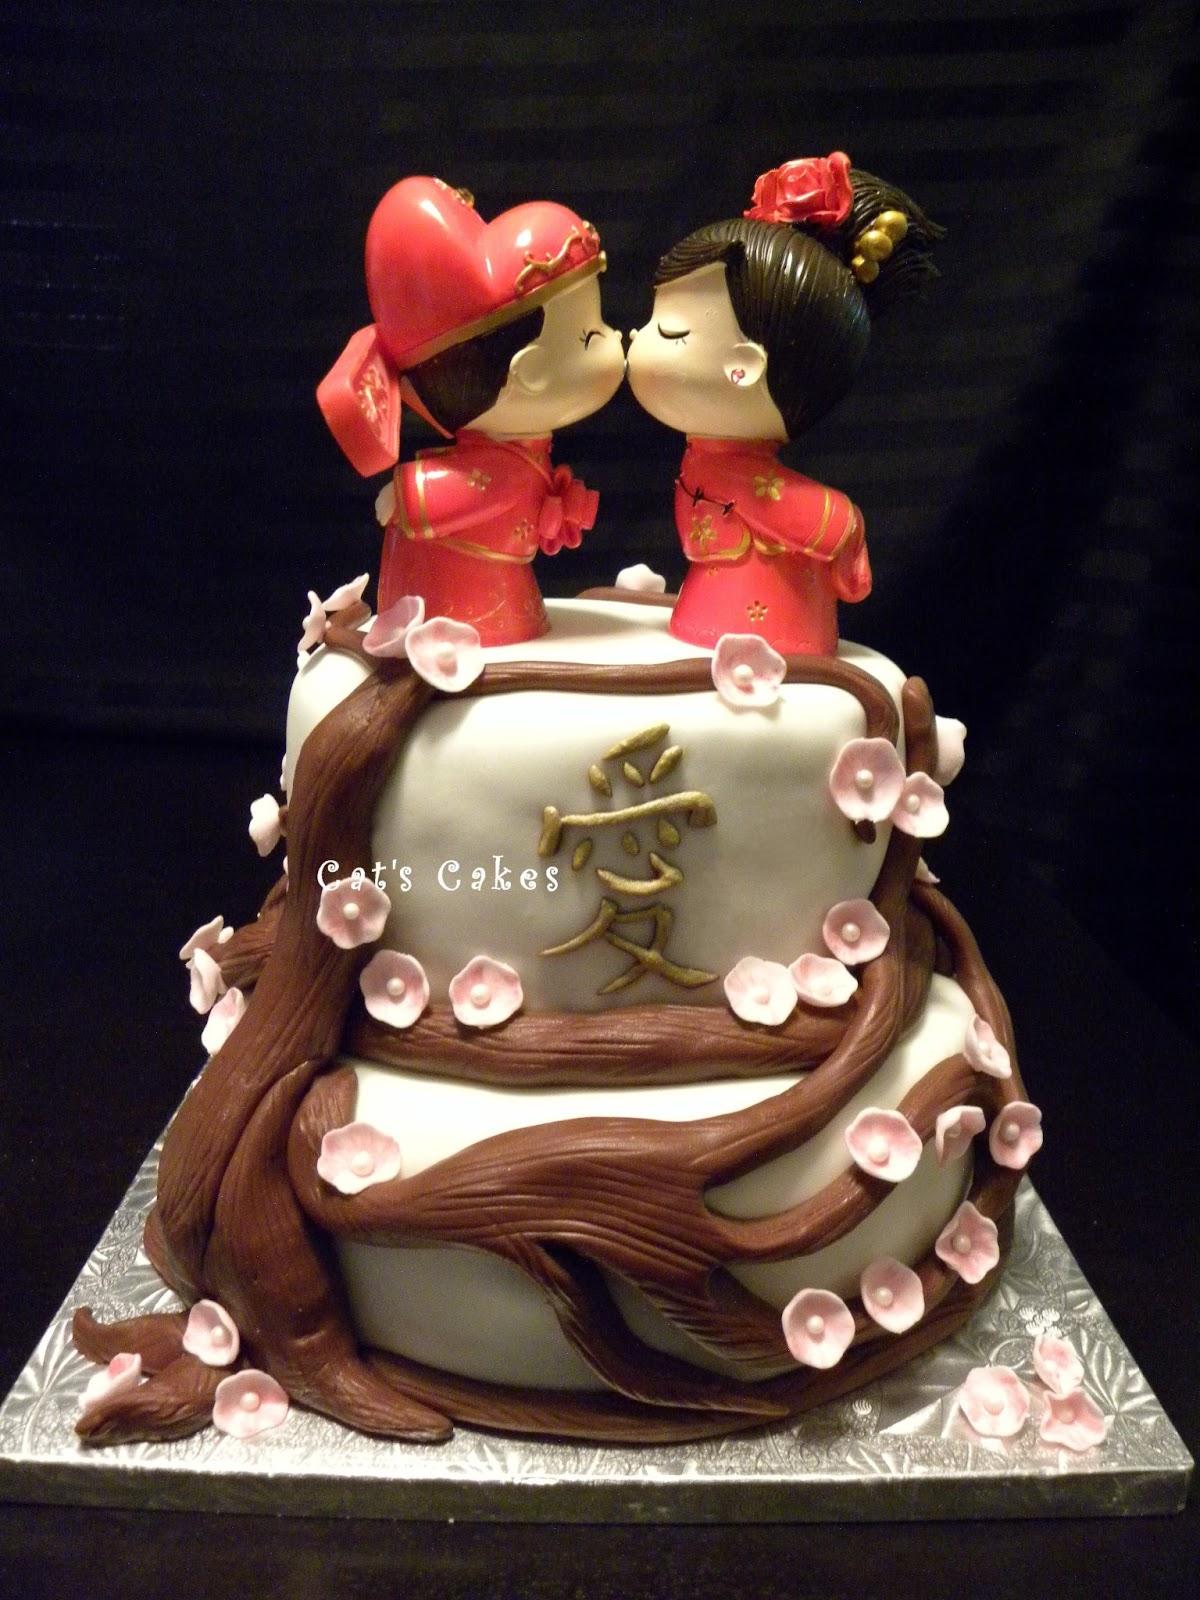 Chinese Themed 15th Anniversary Cake